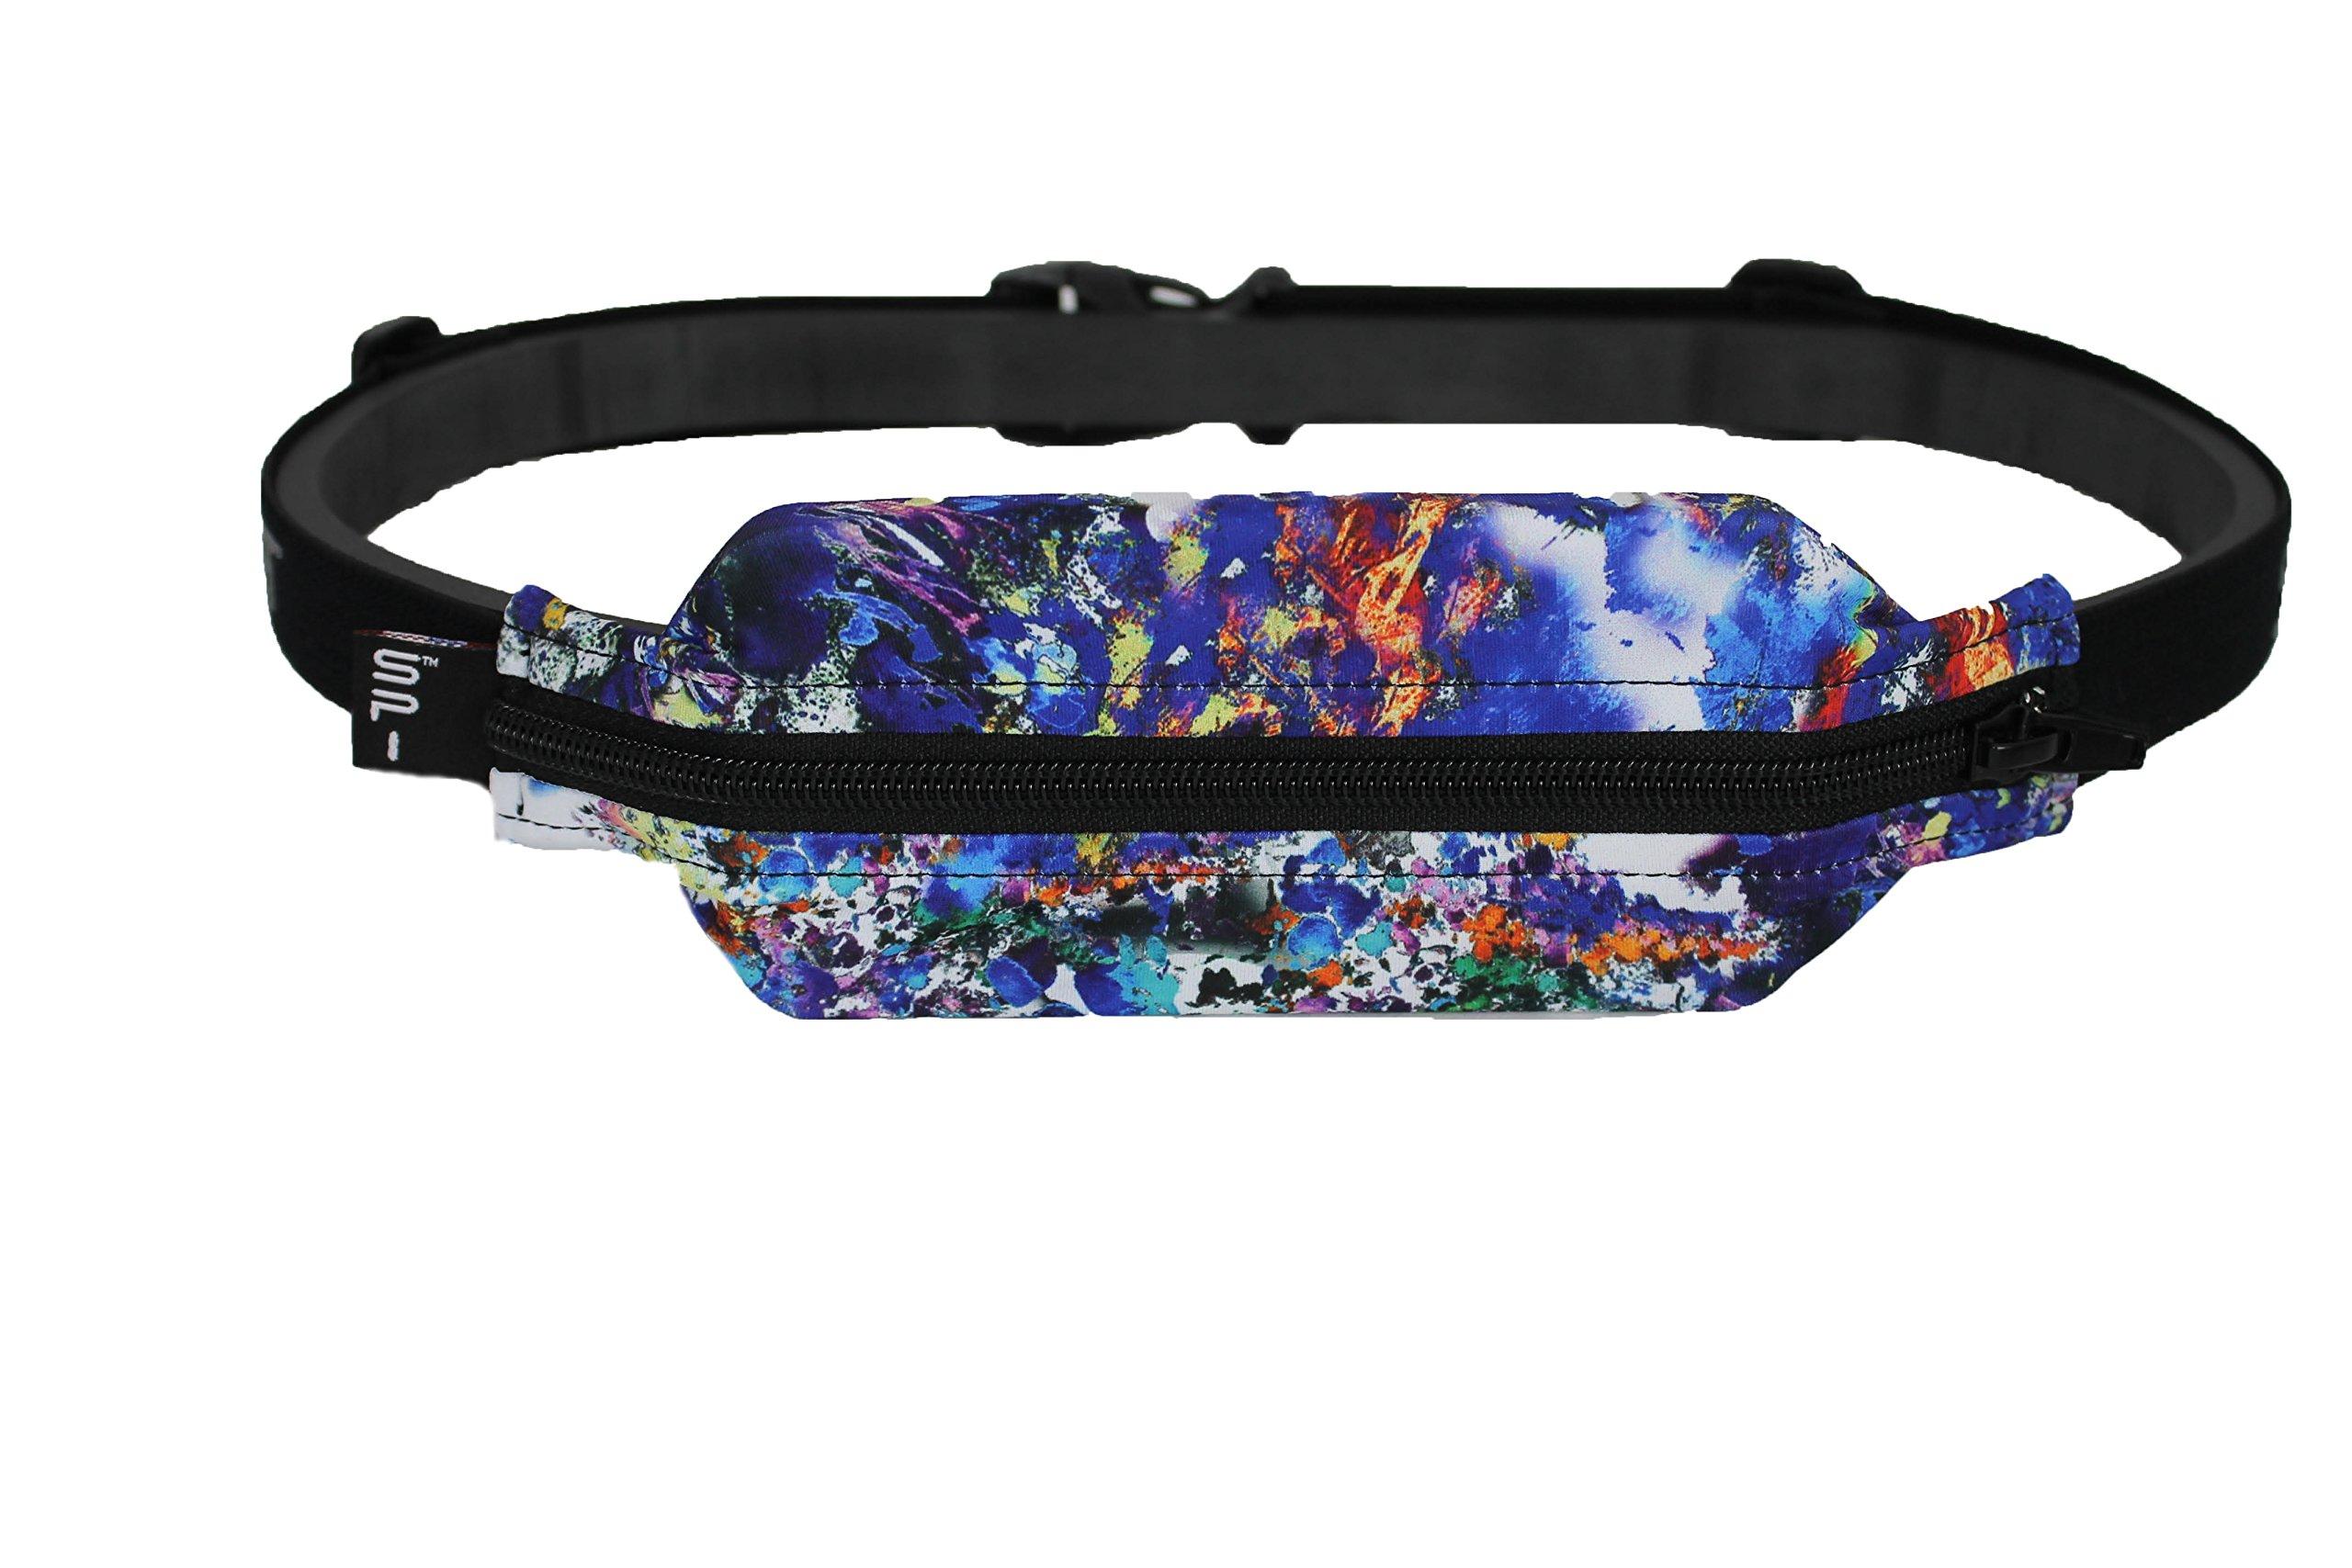 SPIbelt Running Belt: Adult Large Pocket - No-Bounce Running Belt for Runners, Athletes and Adventurers (Reef with Black Zipper, 25'' through 47'')